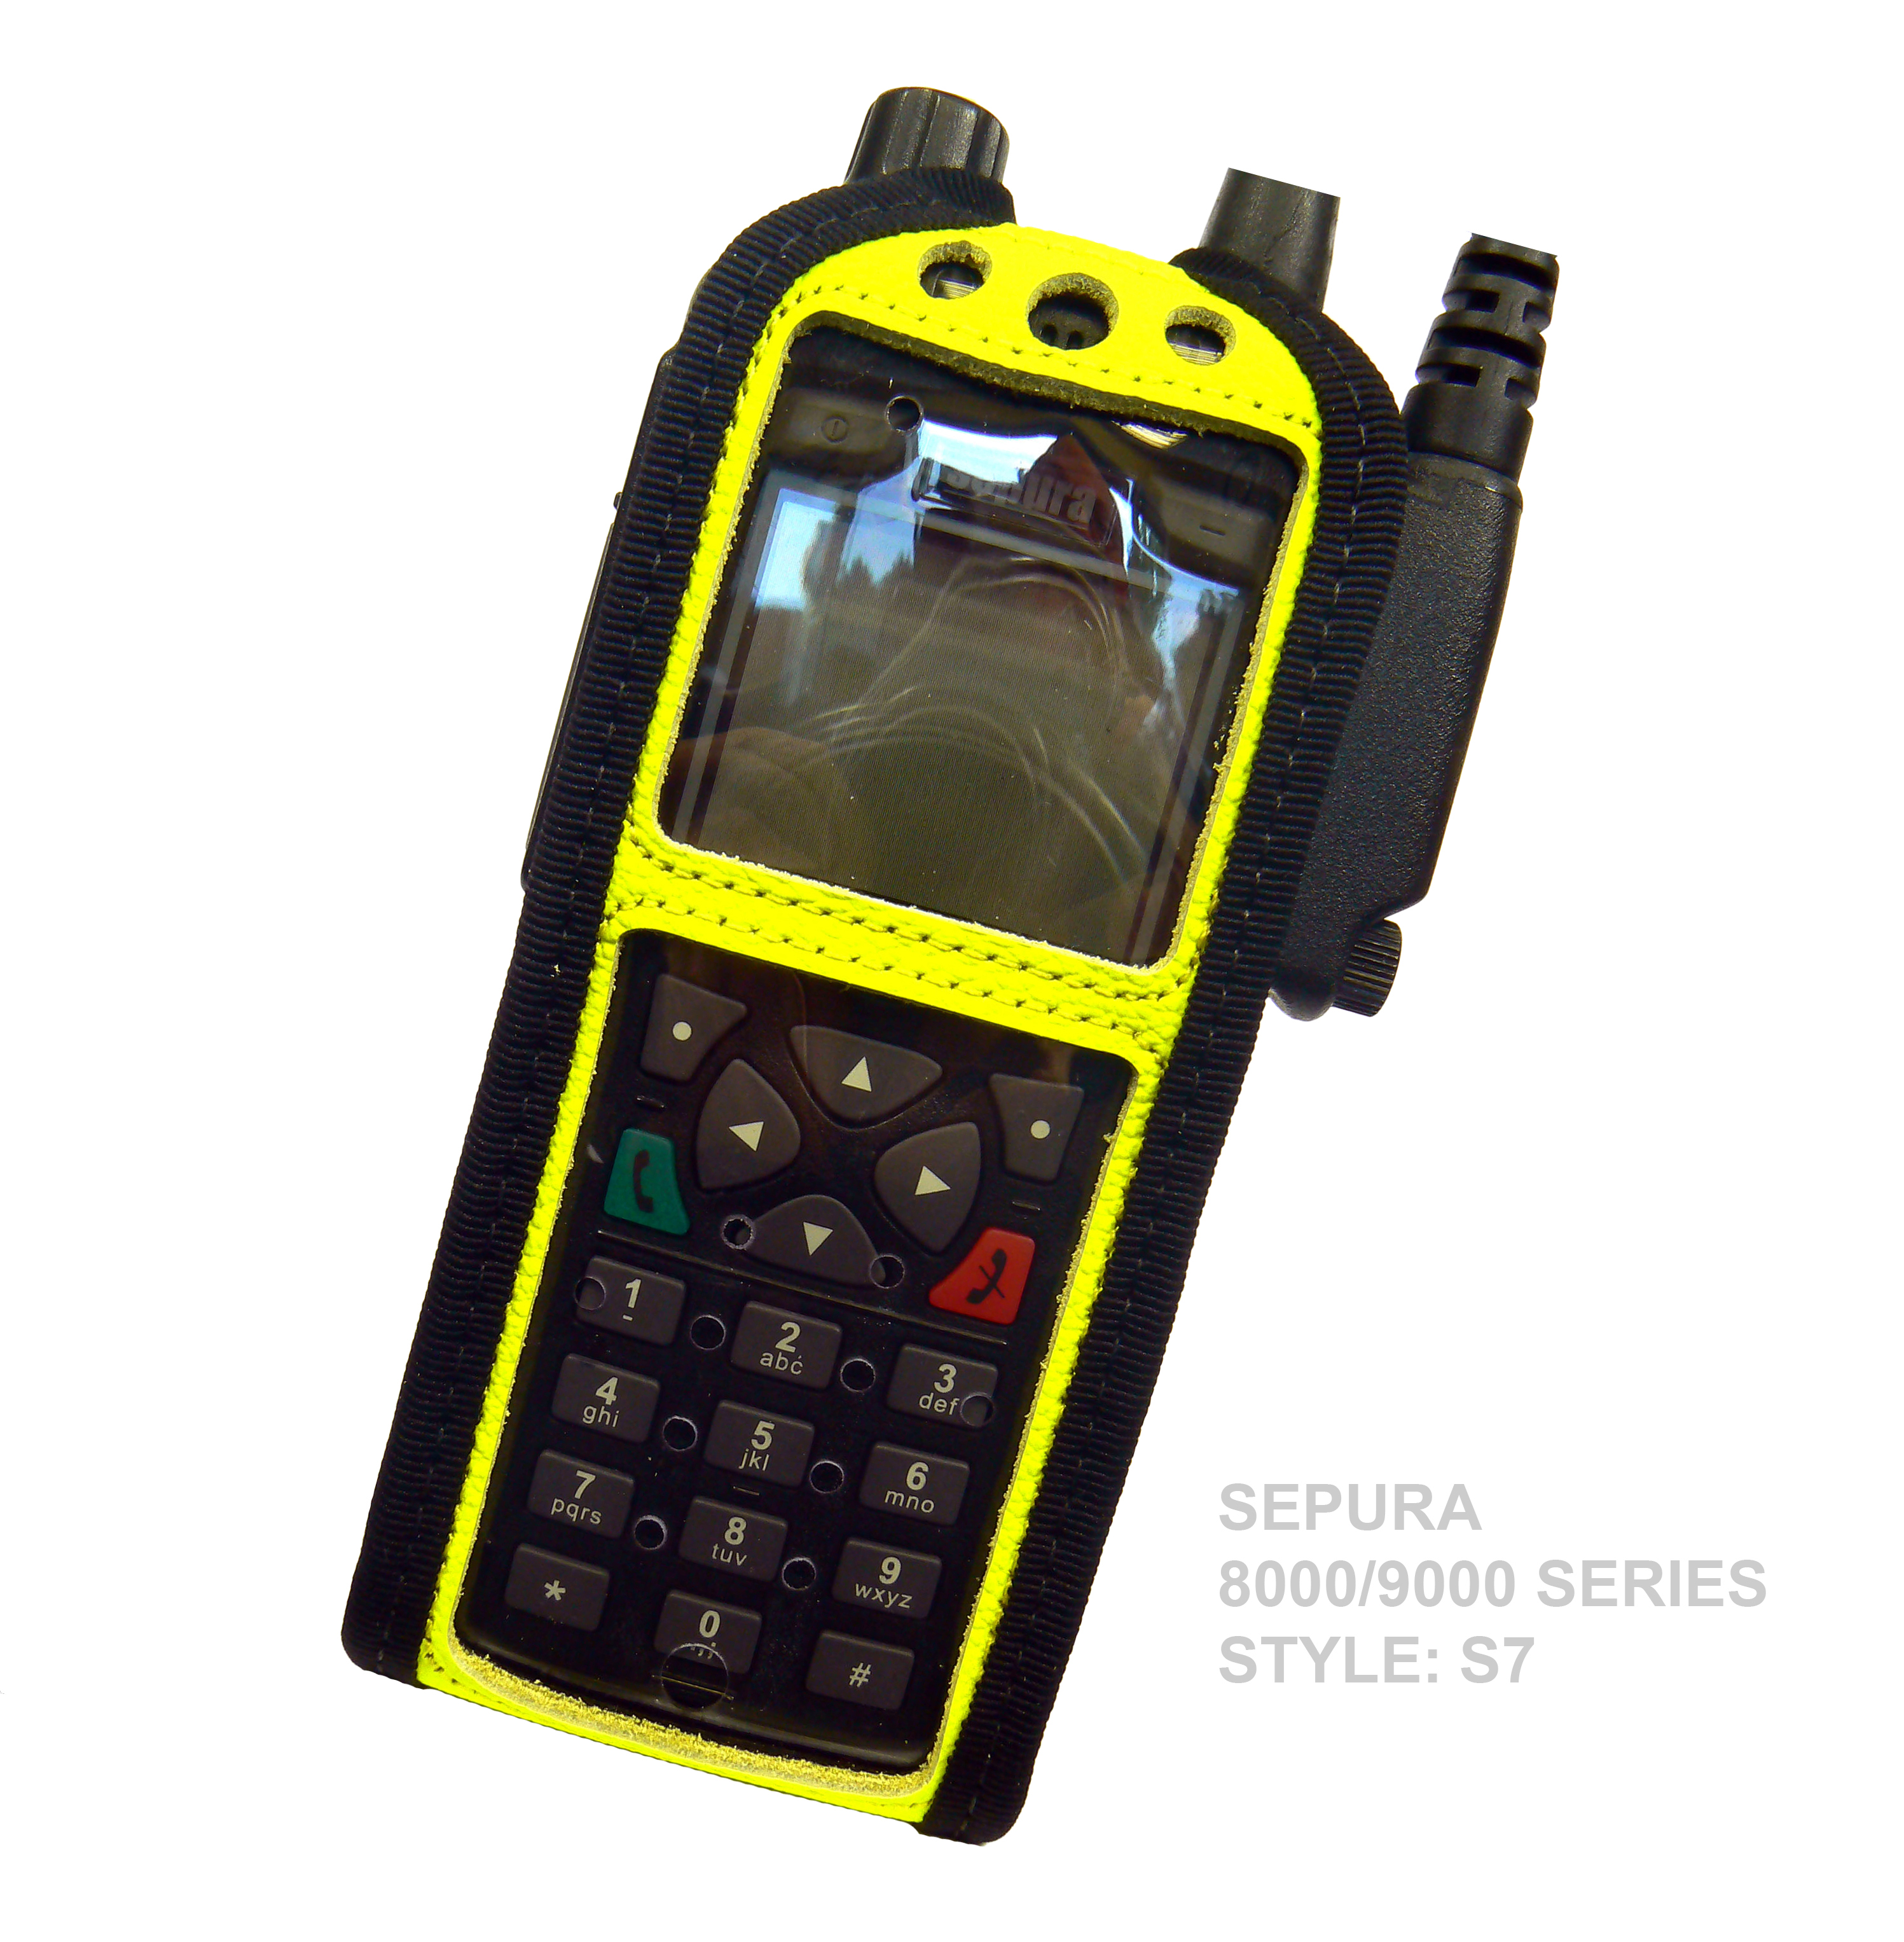 Sepura STP8000 Tetra Hi-Vis Yellow leather radio case with Click-On